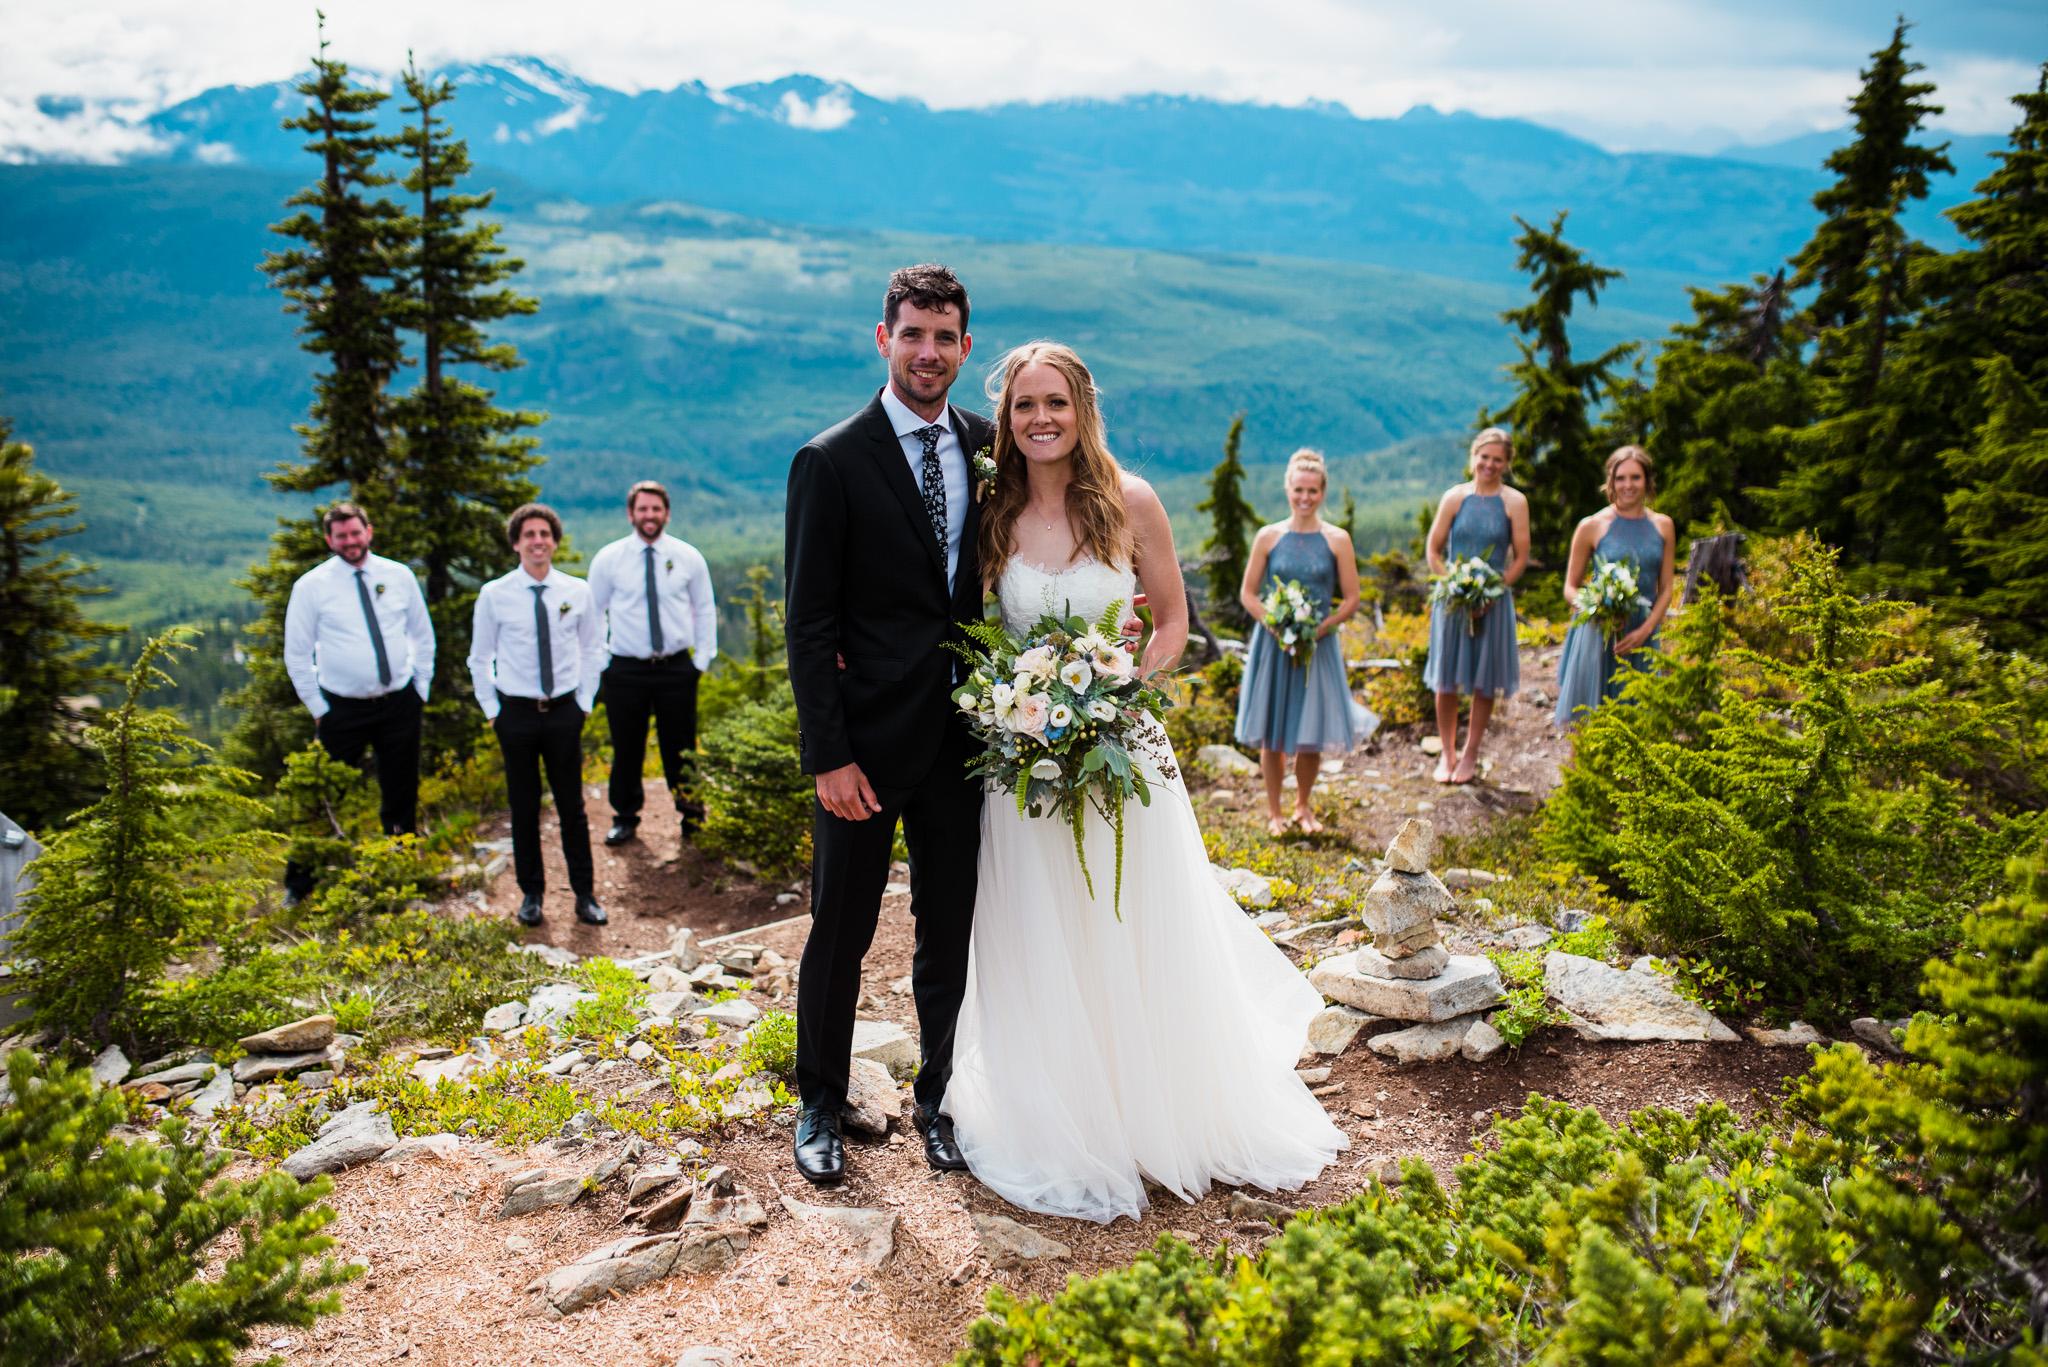 victoria-wedding-photographers-mount-washington-winter-wedding-38.jpg